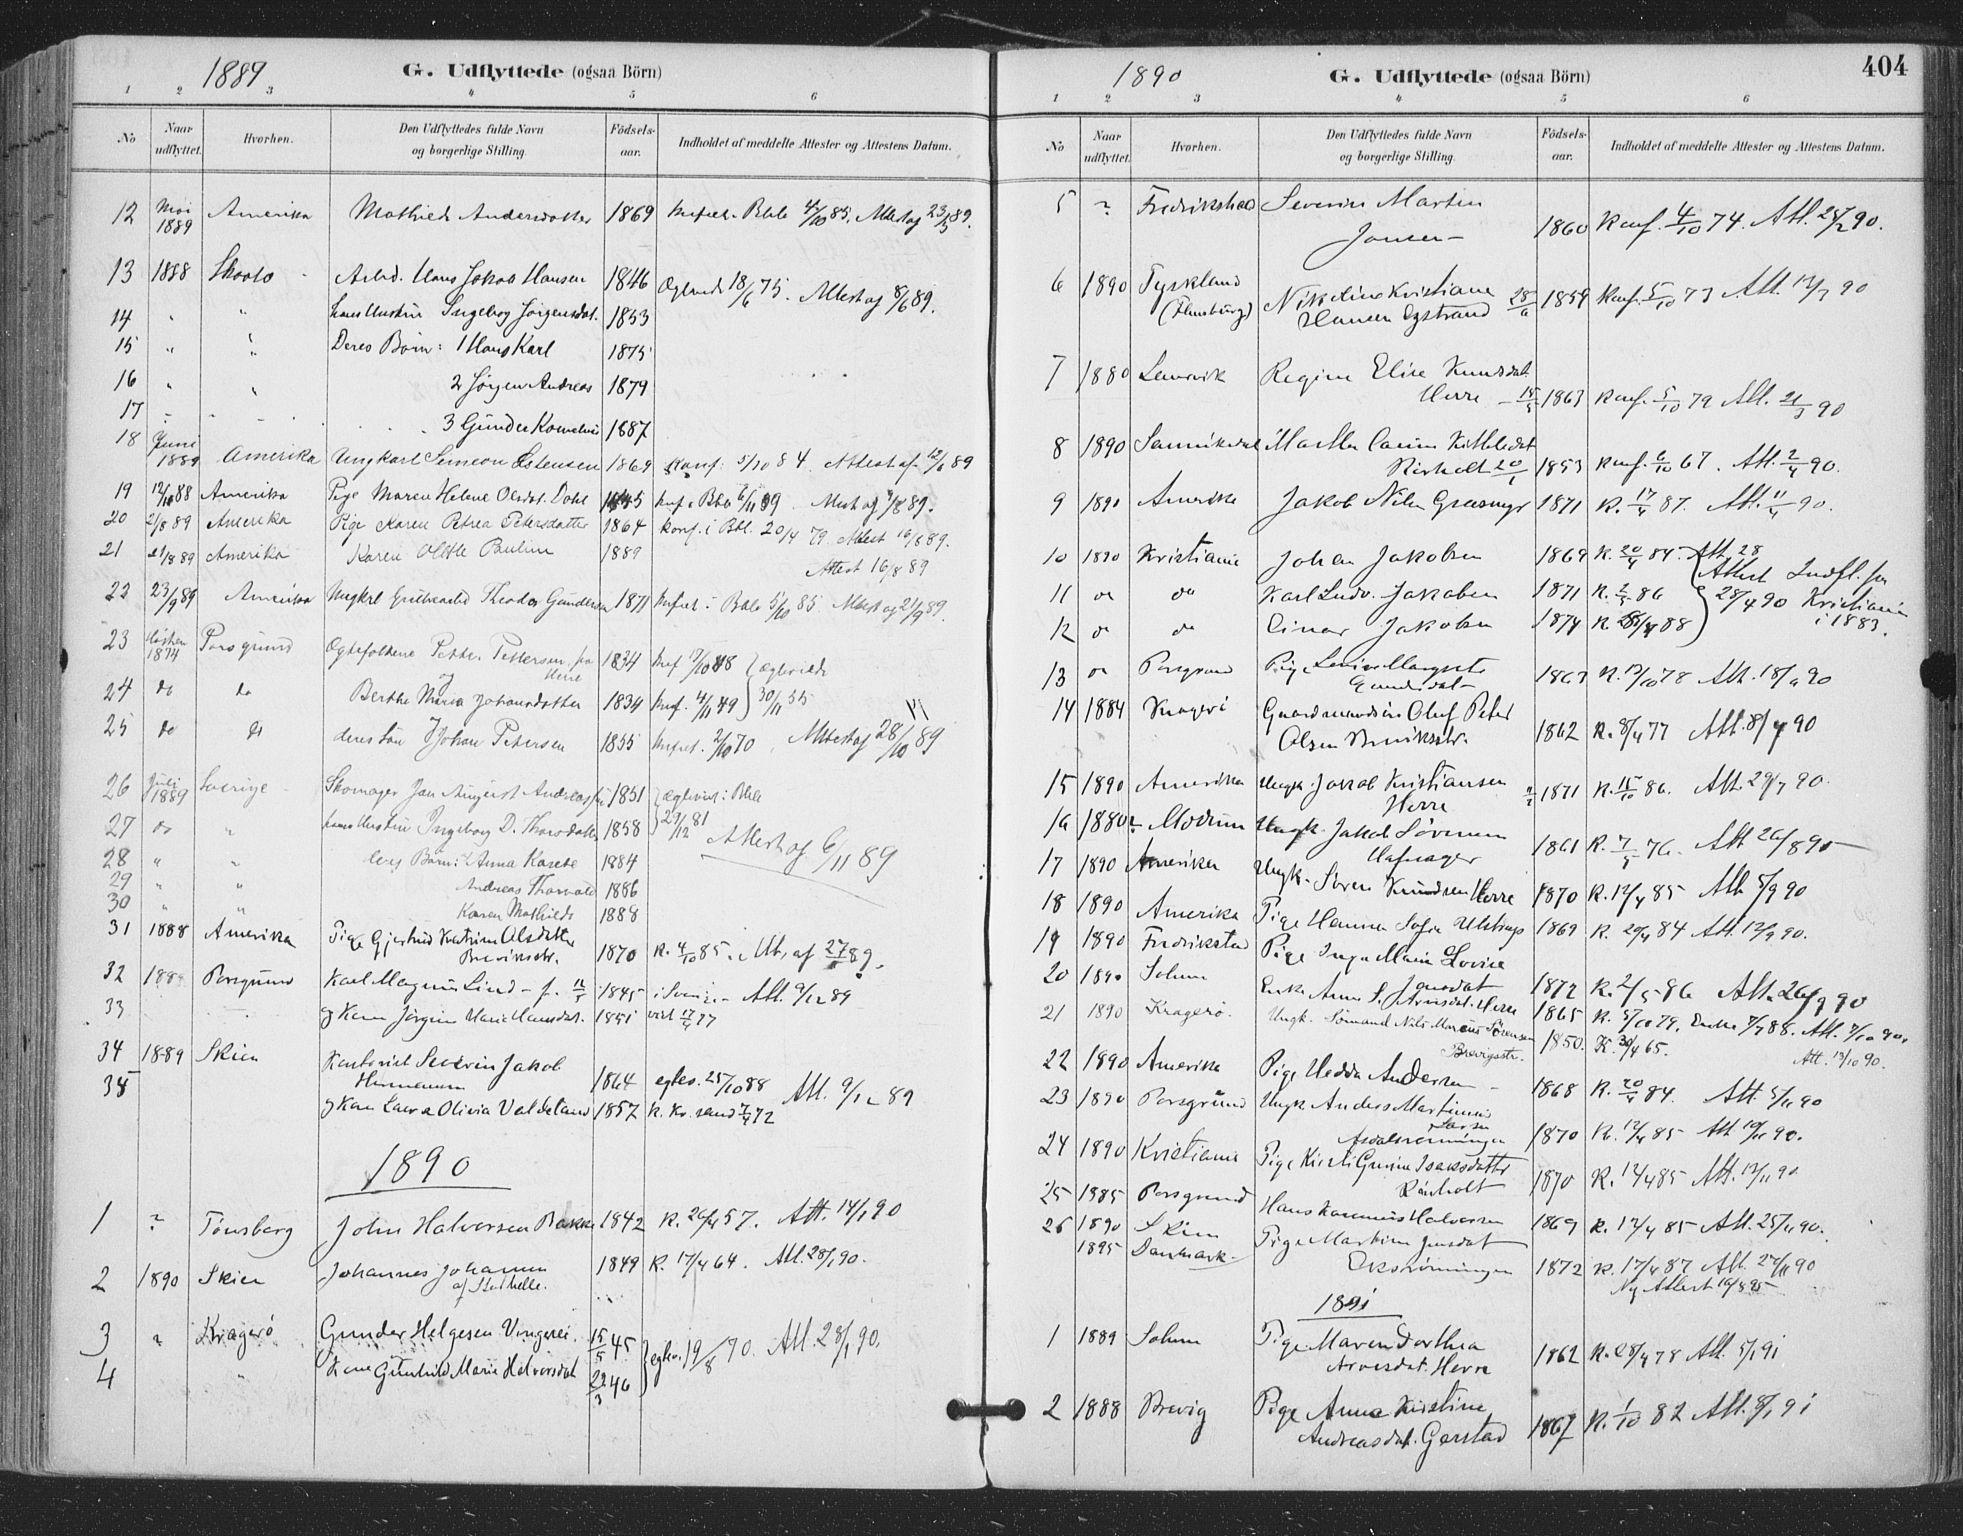 SAKO, Bamble kirkebøker, F/Fa/L0008: Ministerialbok nr. I 8, 1888-1900, s. 404